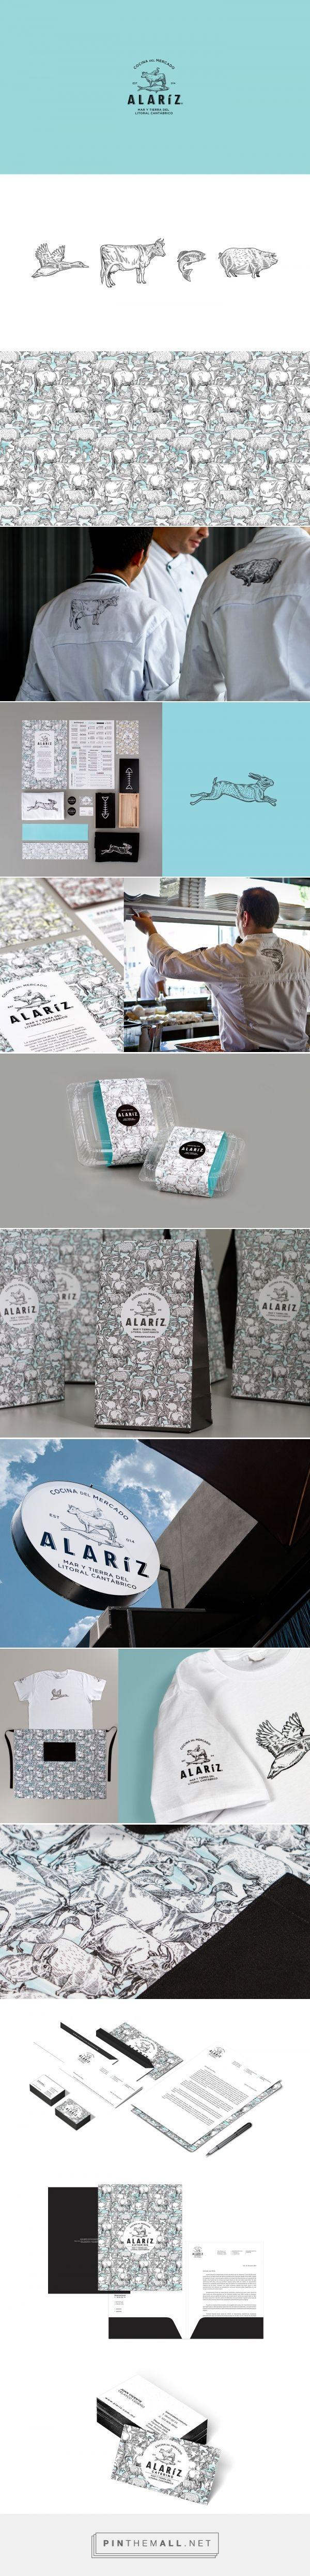 Alaríz Restaurant Branding and Menu Design by Henriquez Lara Estudio | Fivestar Branding Agency – Design and Branding Agency & Curated Inspiration Gallery